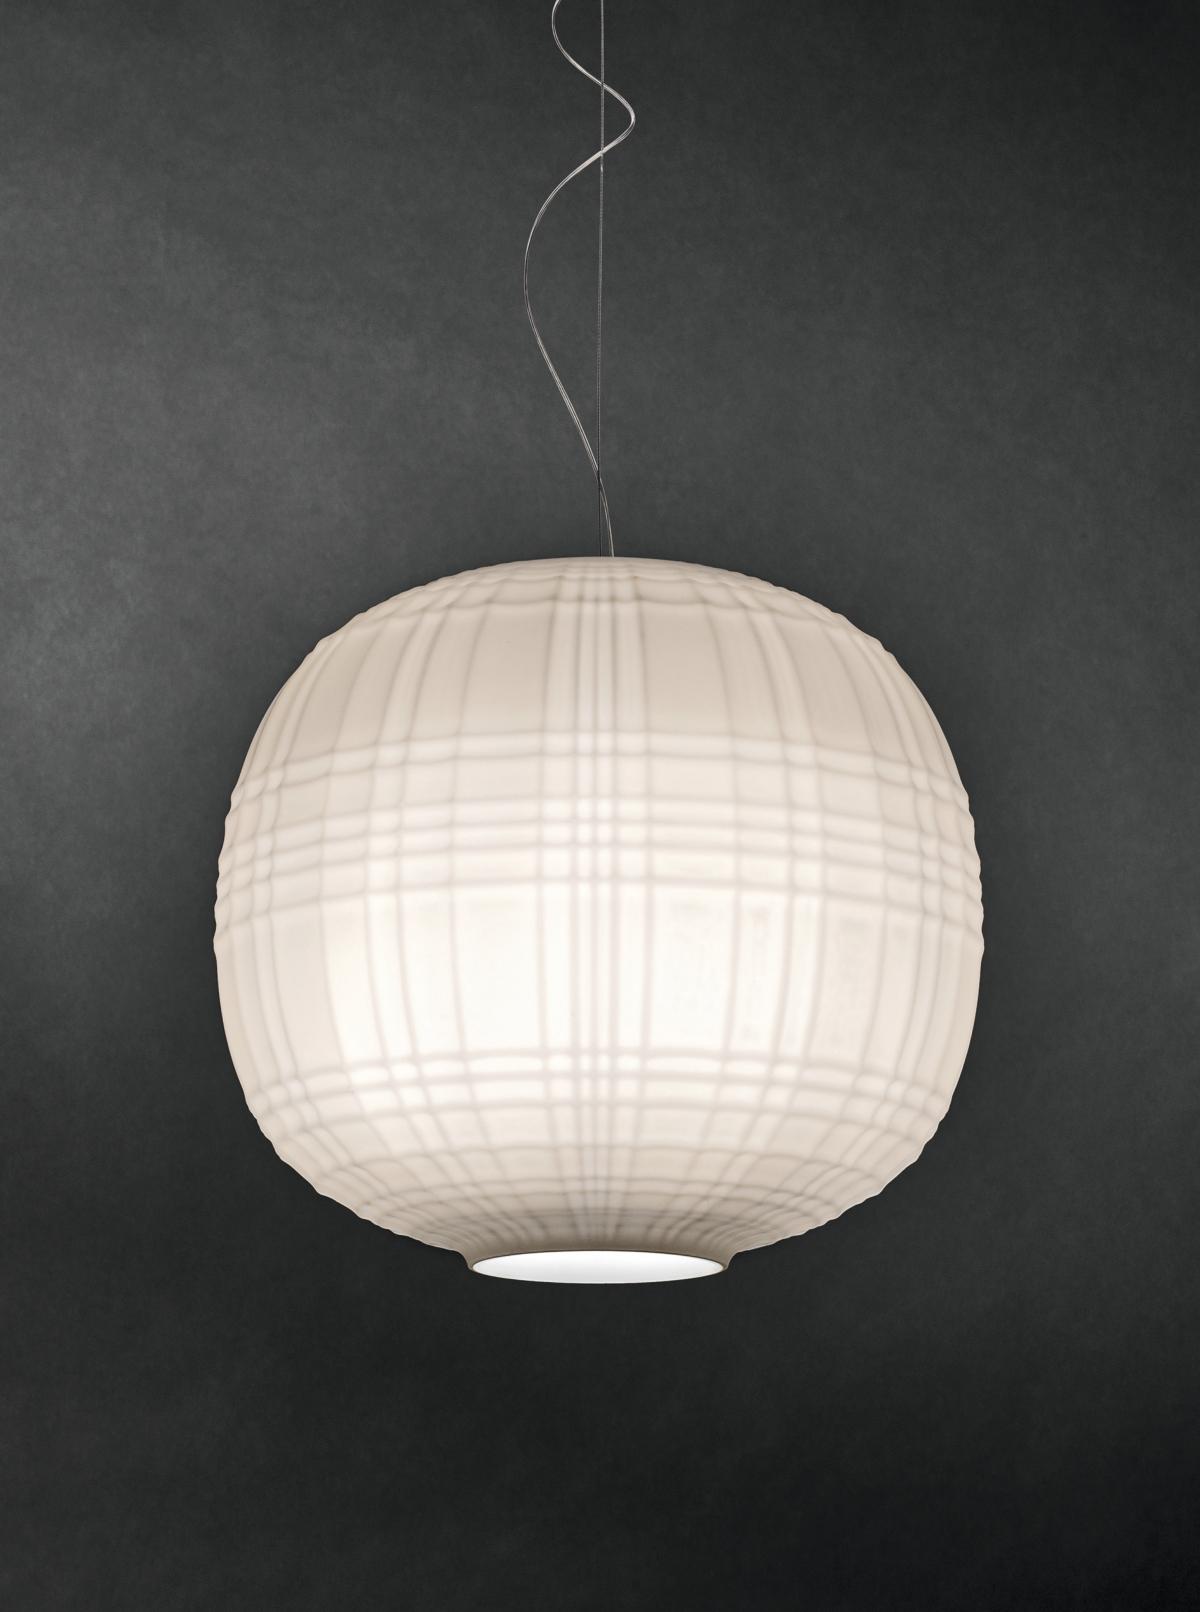 Tartan lamp in blown glass still